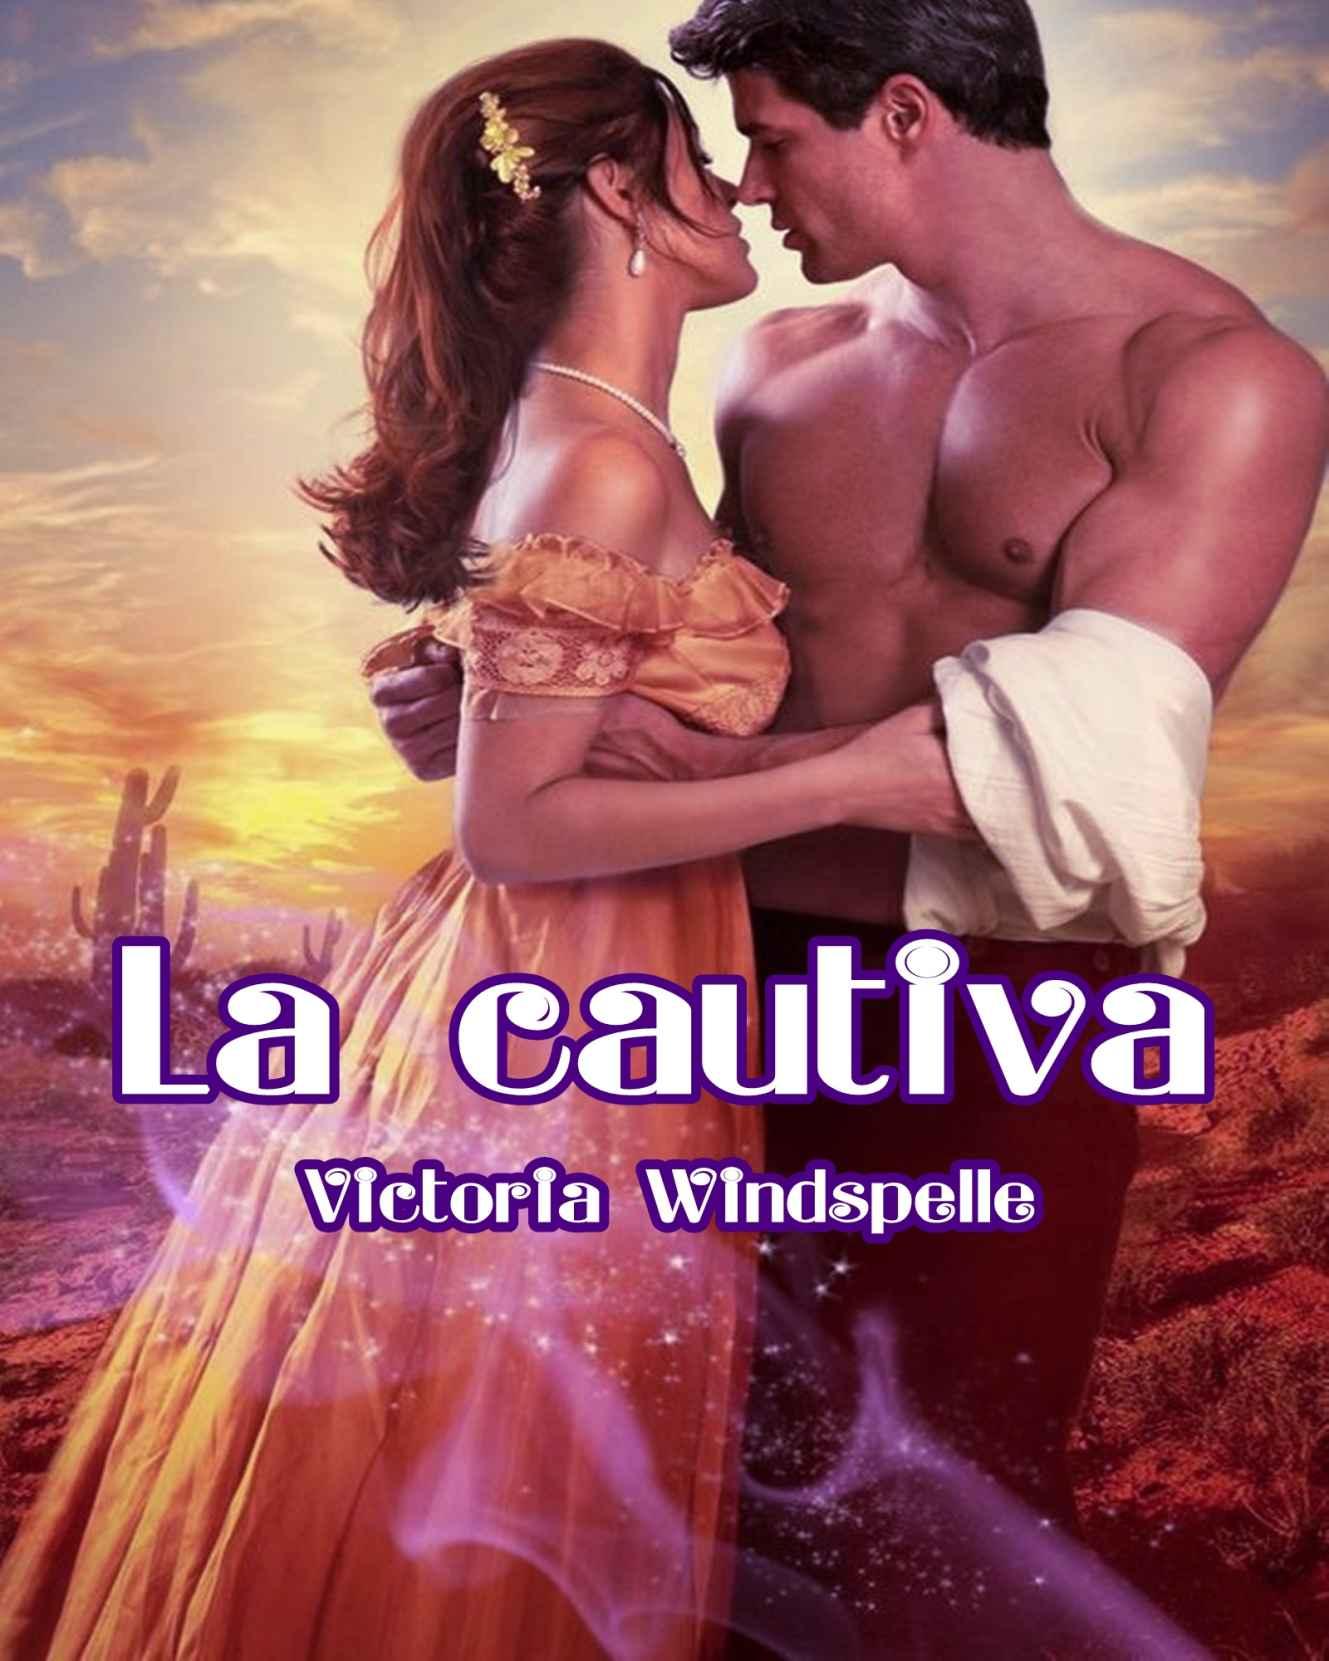 La cautiva de Victoria Windspelle